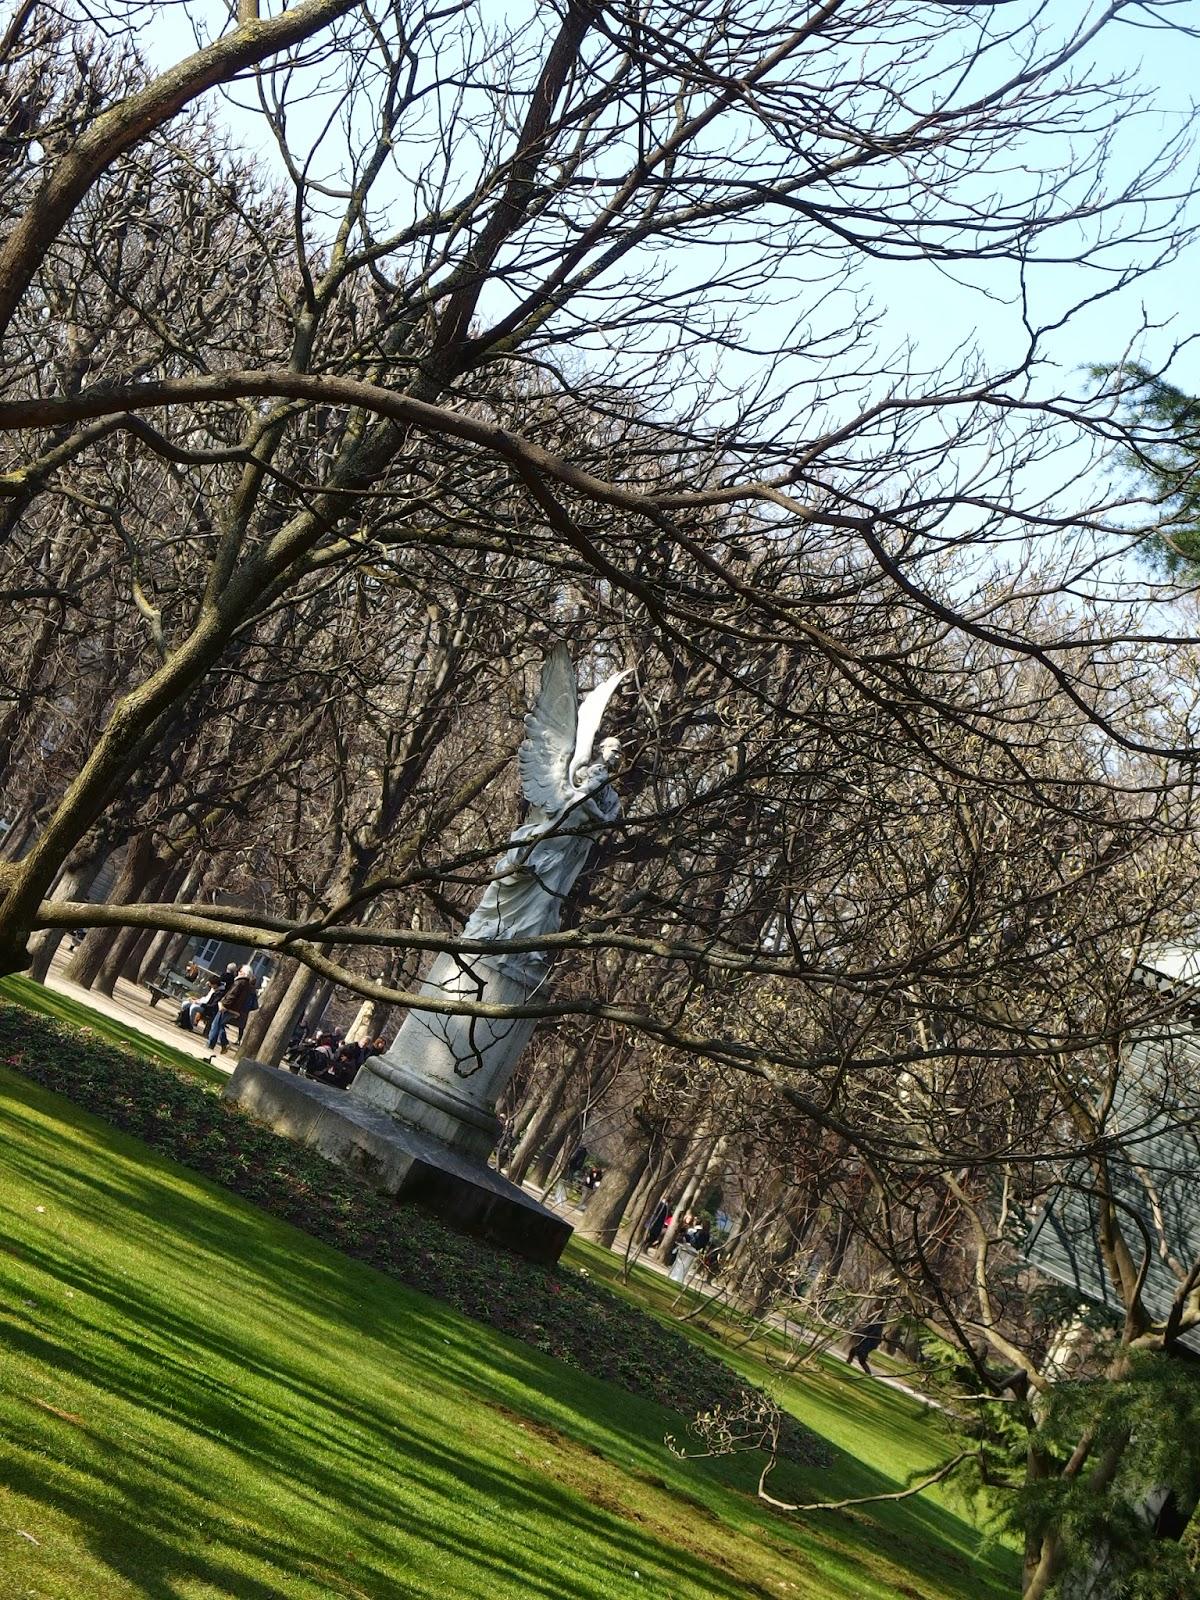 Jardin du luxembourg palace gardens paris joshua hideki for Jardin luxembourg